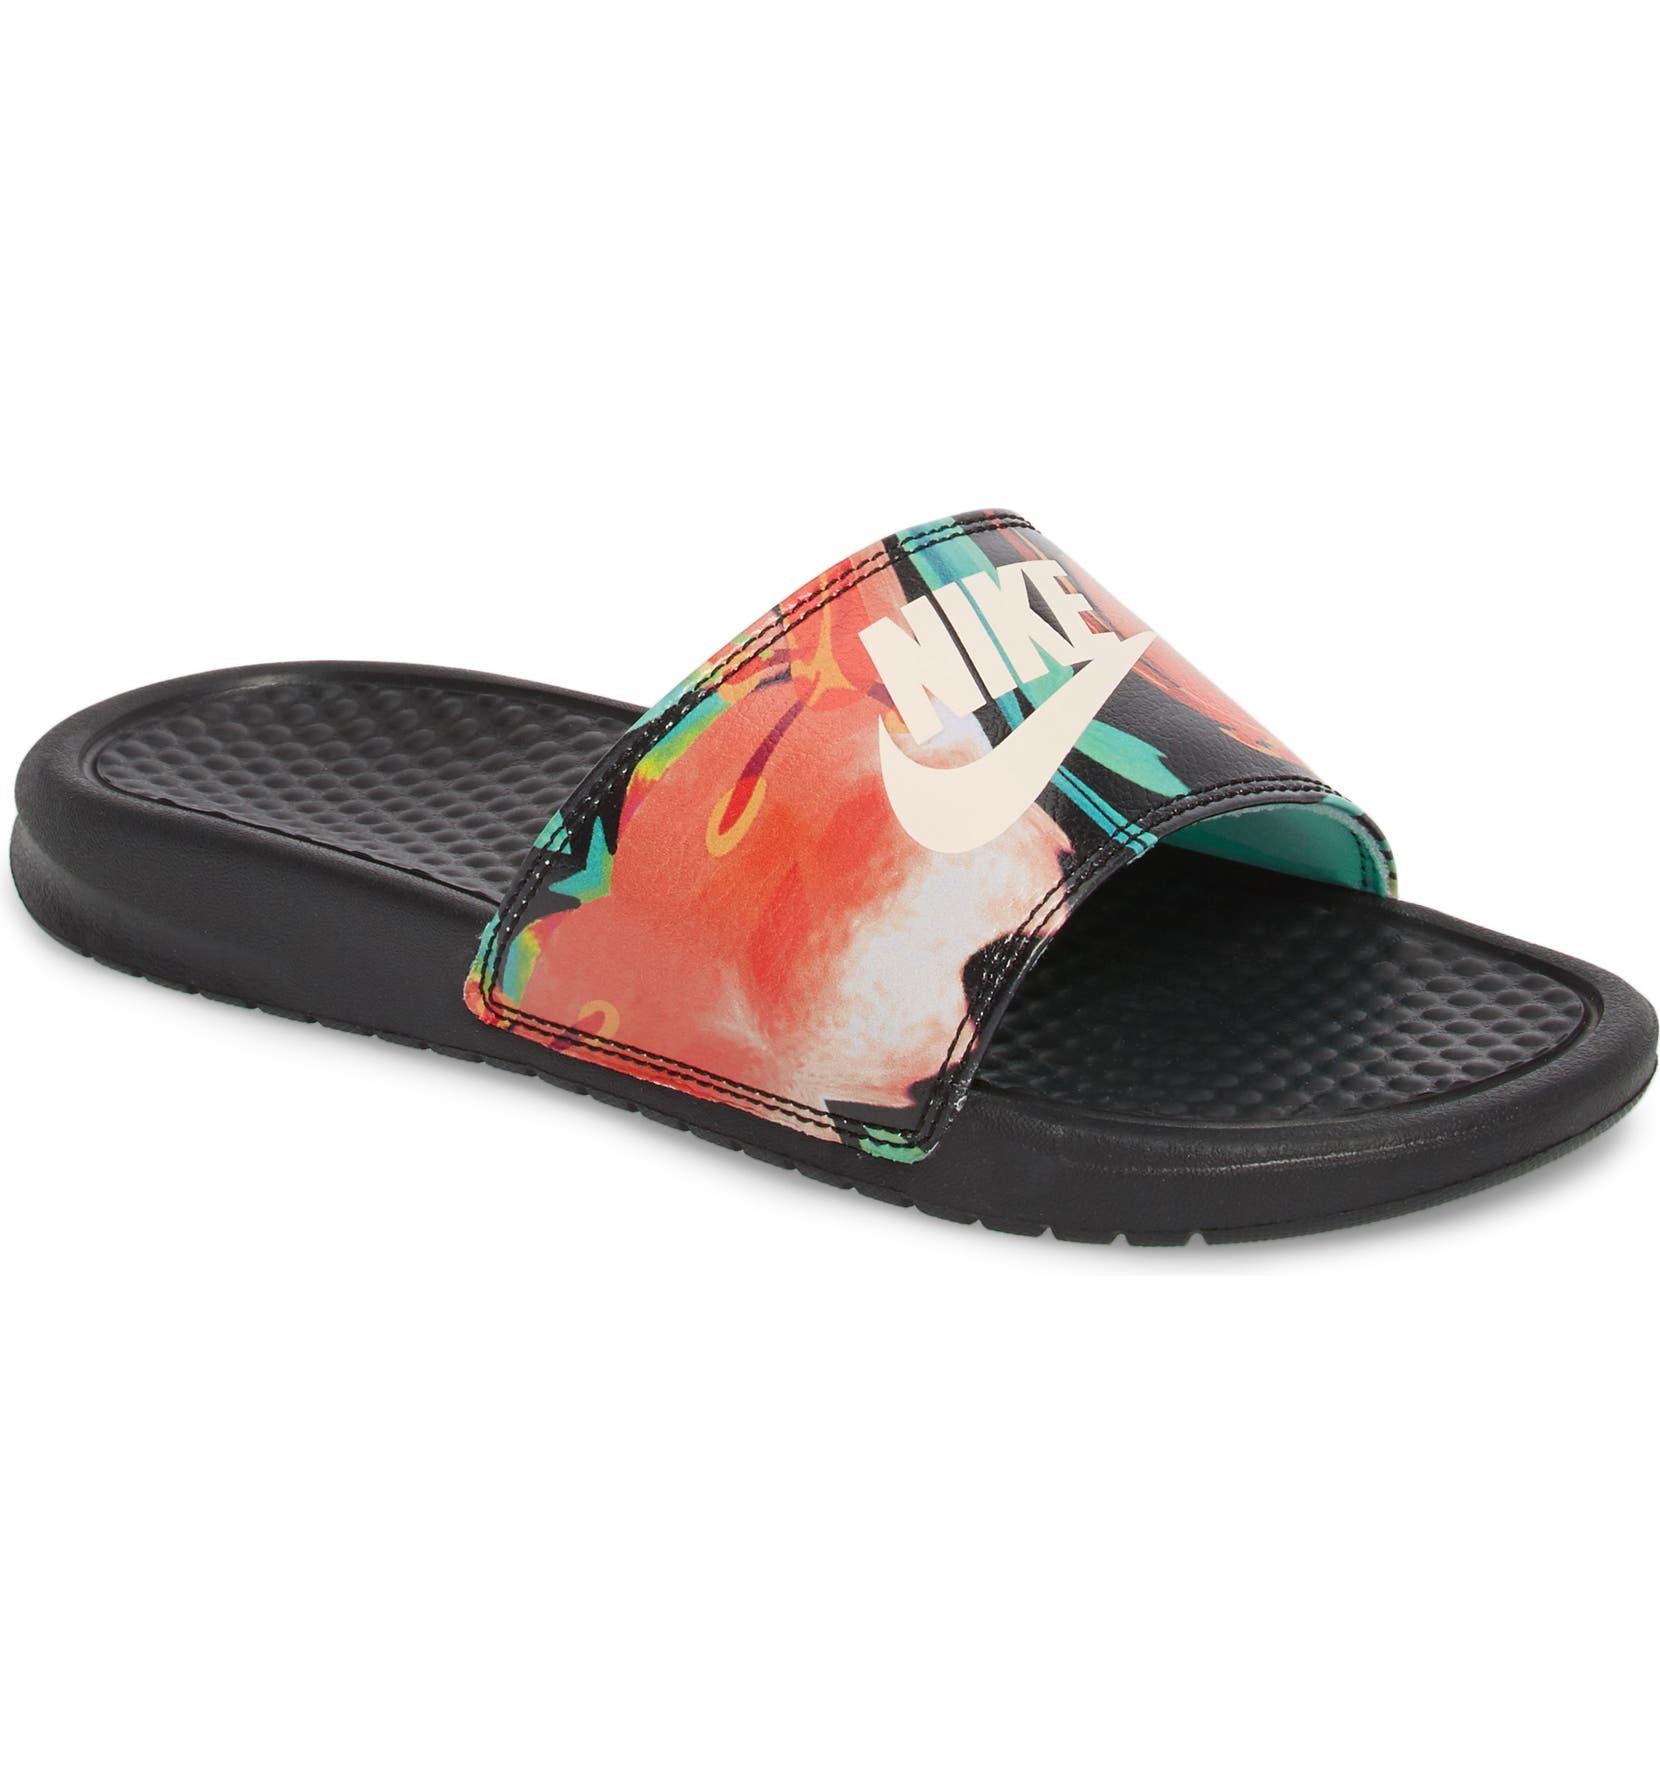 Nike  Benassi - Just Do It  Print Sandal (Women)  3141b4440